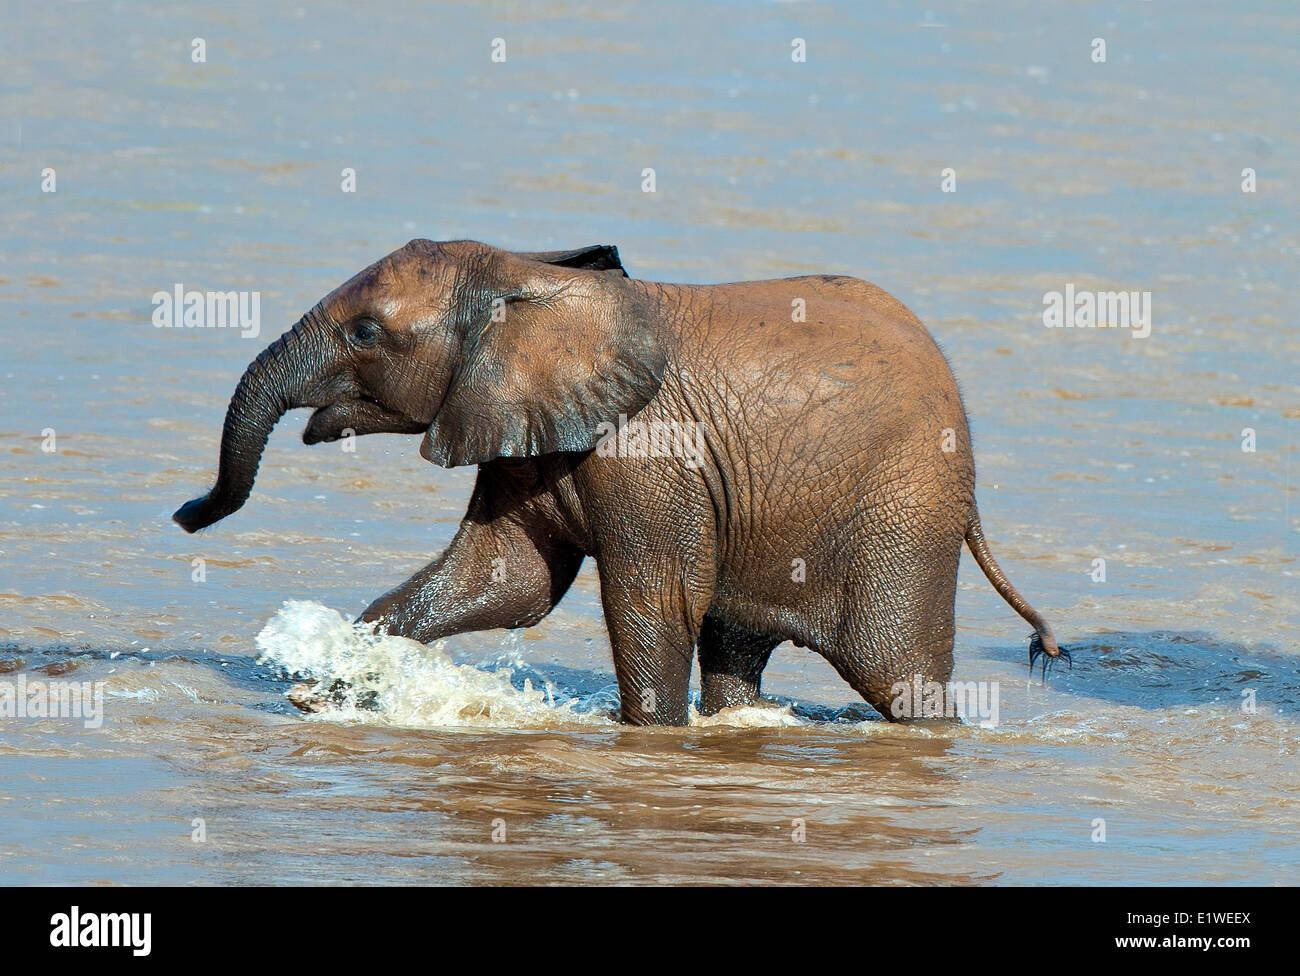 Sabana Africana ternero de elefantes (Loxodonta africana), cruzando el río Ewaso Ng'iro, Parque Nacional de Samburu, Kenia, África Oriental Foto de stock